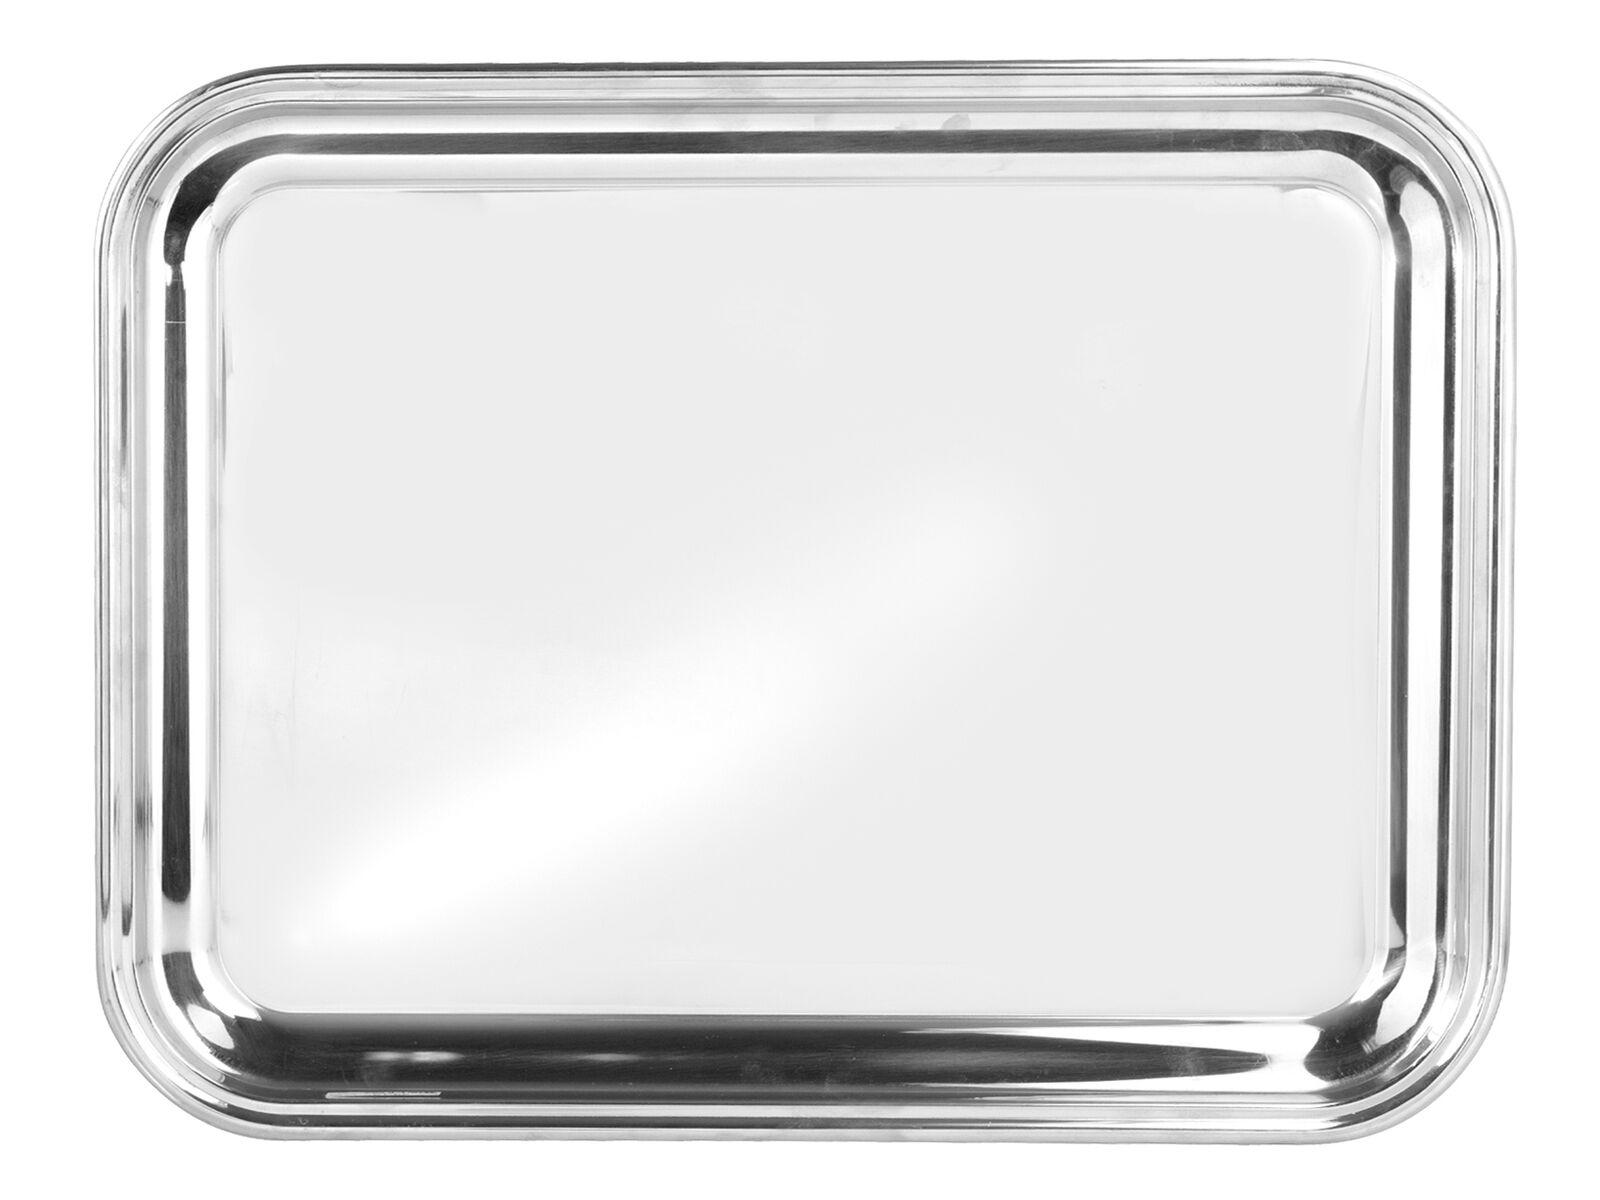 PINTI Vassoio Rettangolare Bar Inox 45X35 Arrougeo Tavola